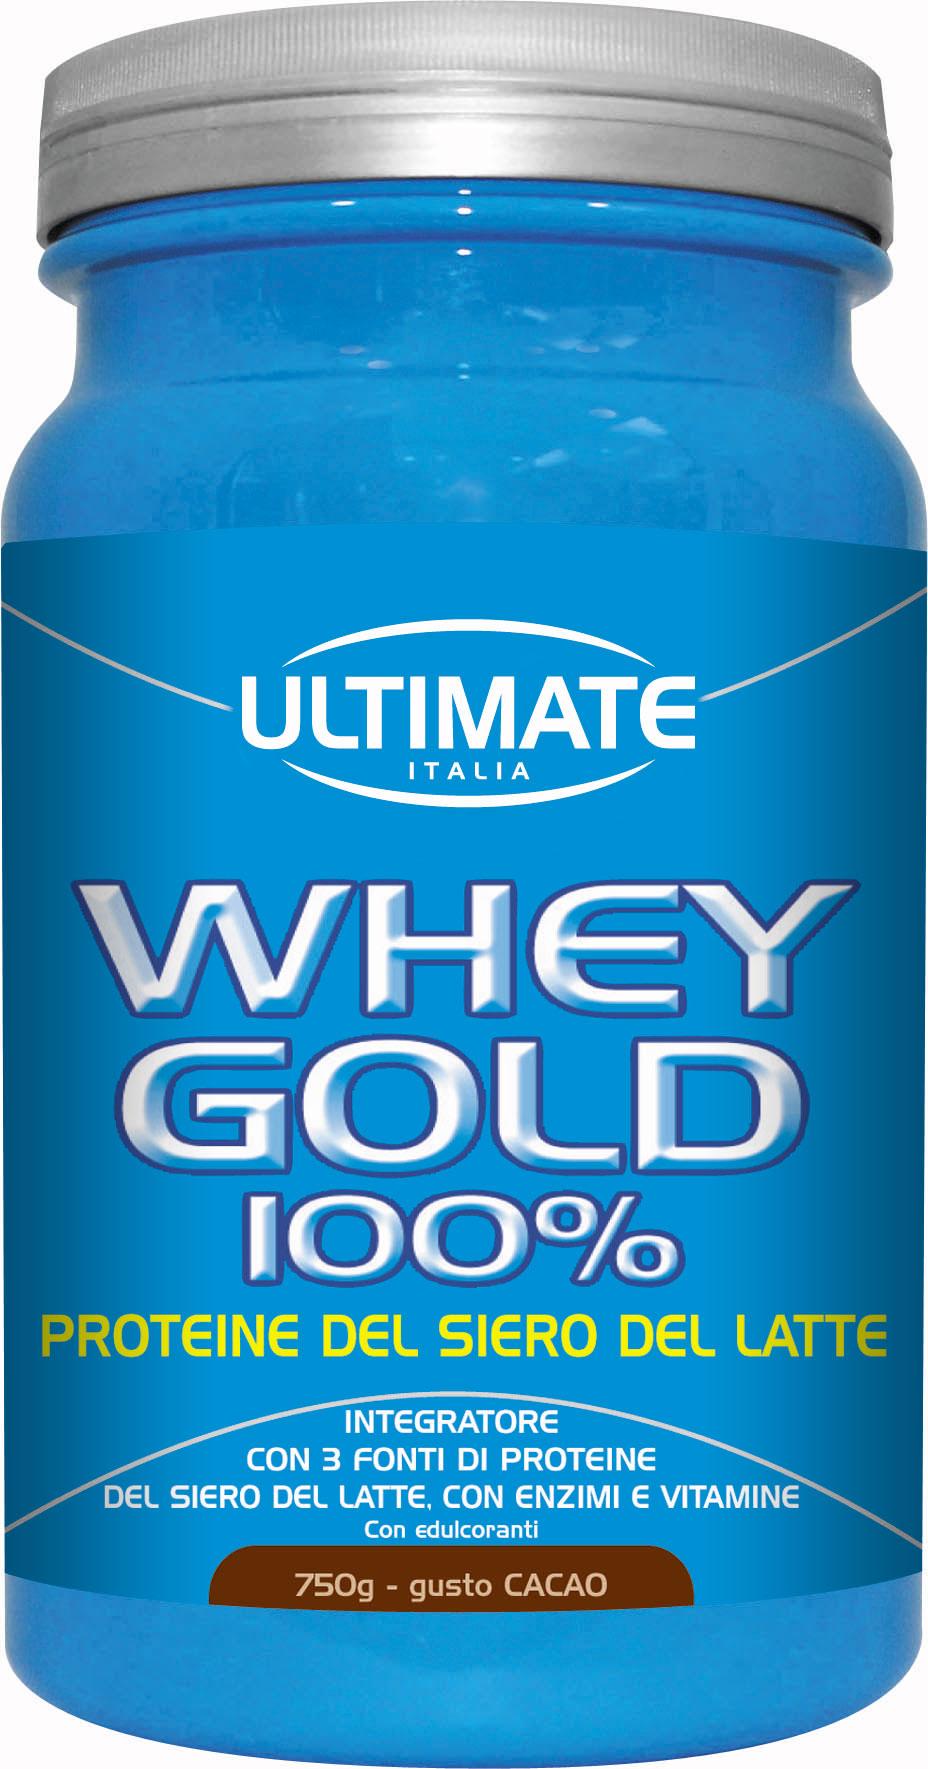 Ultimate Whey Gold 100% Integratore Alimentare Gusto Cacao 750g